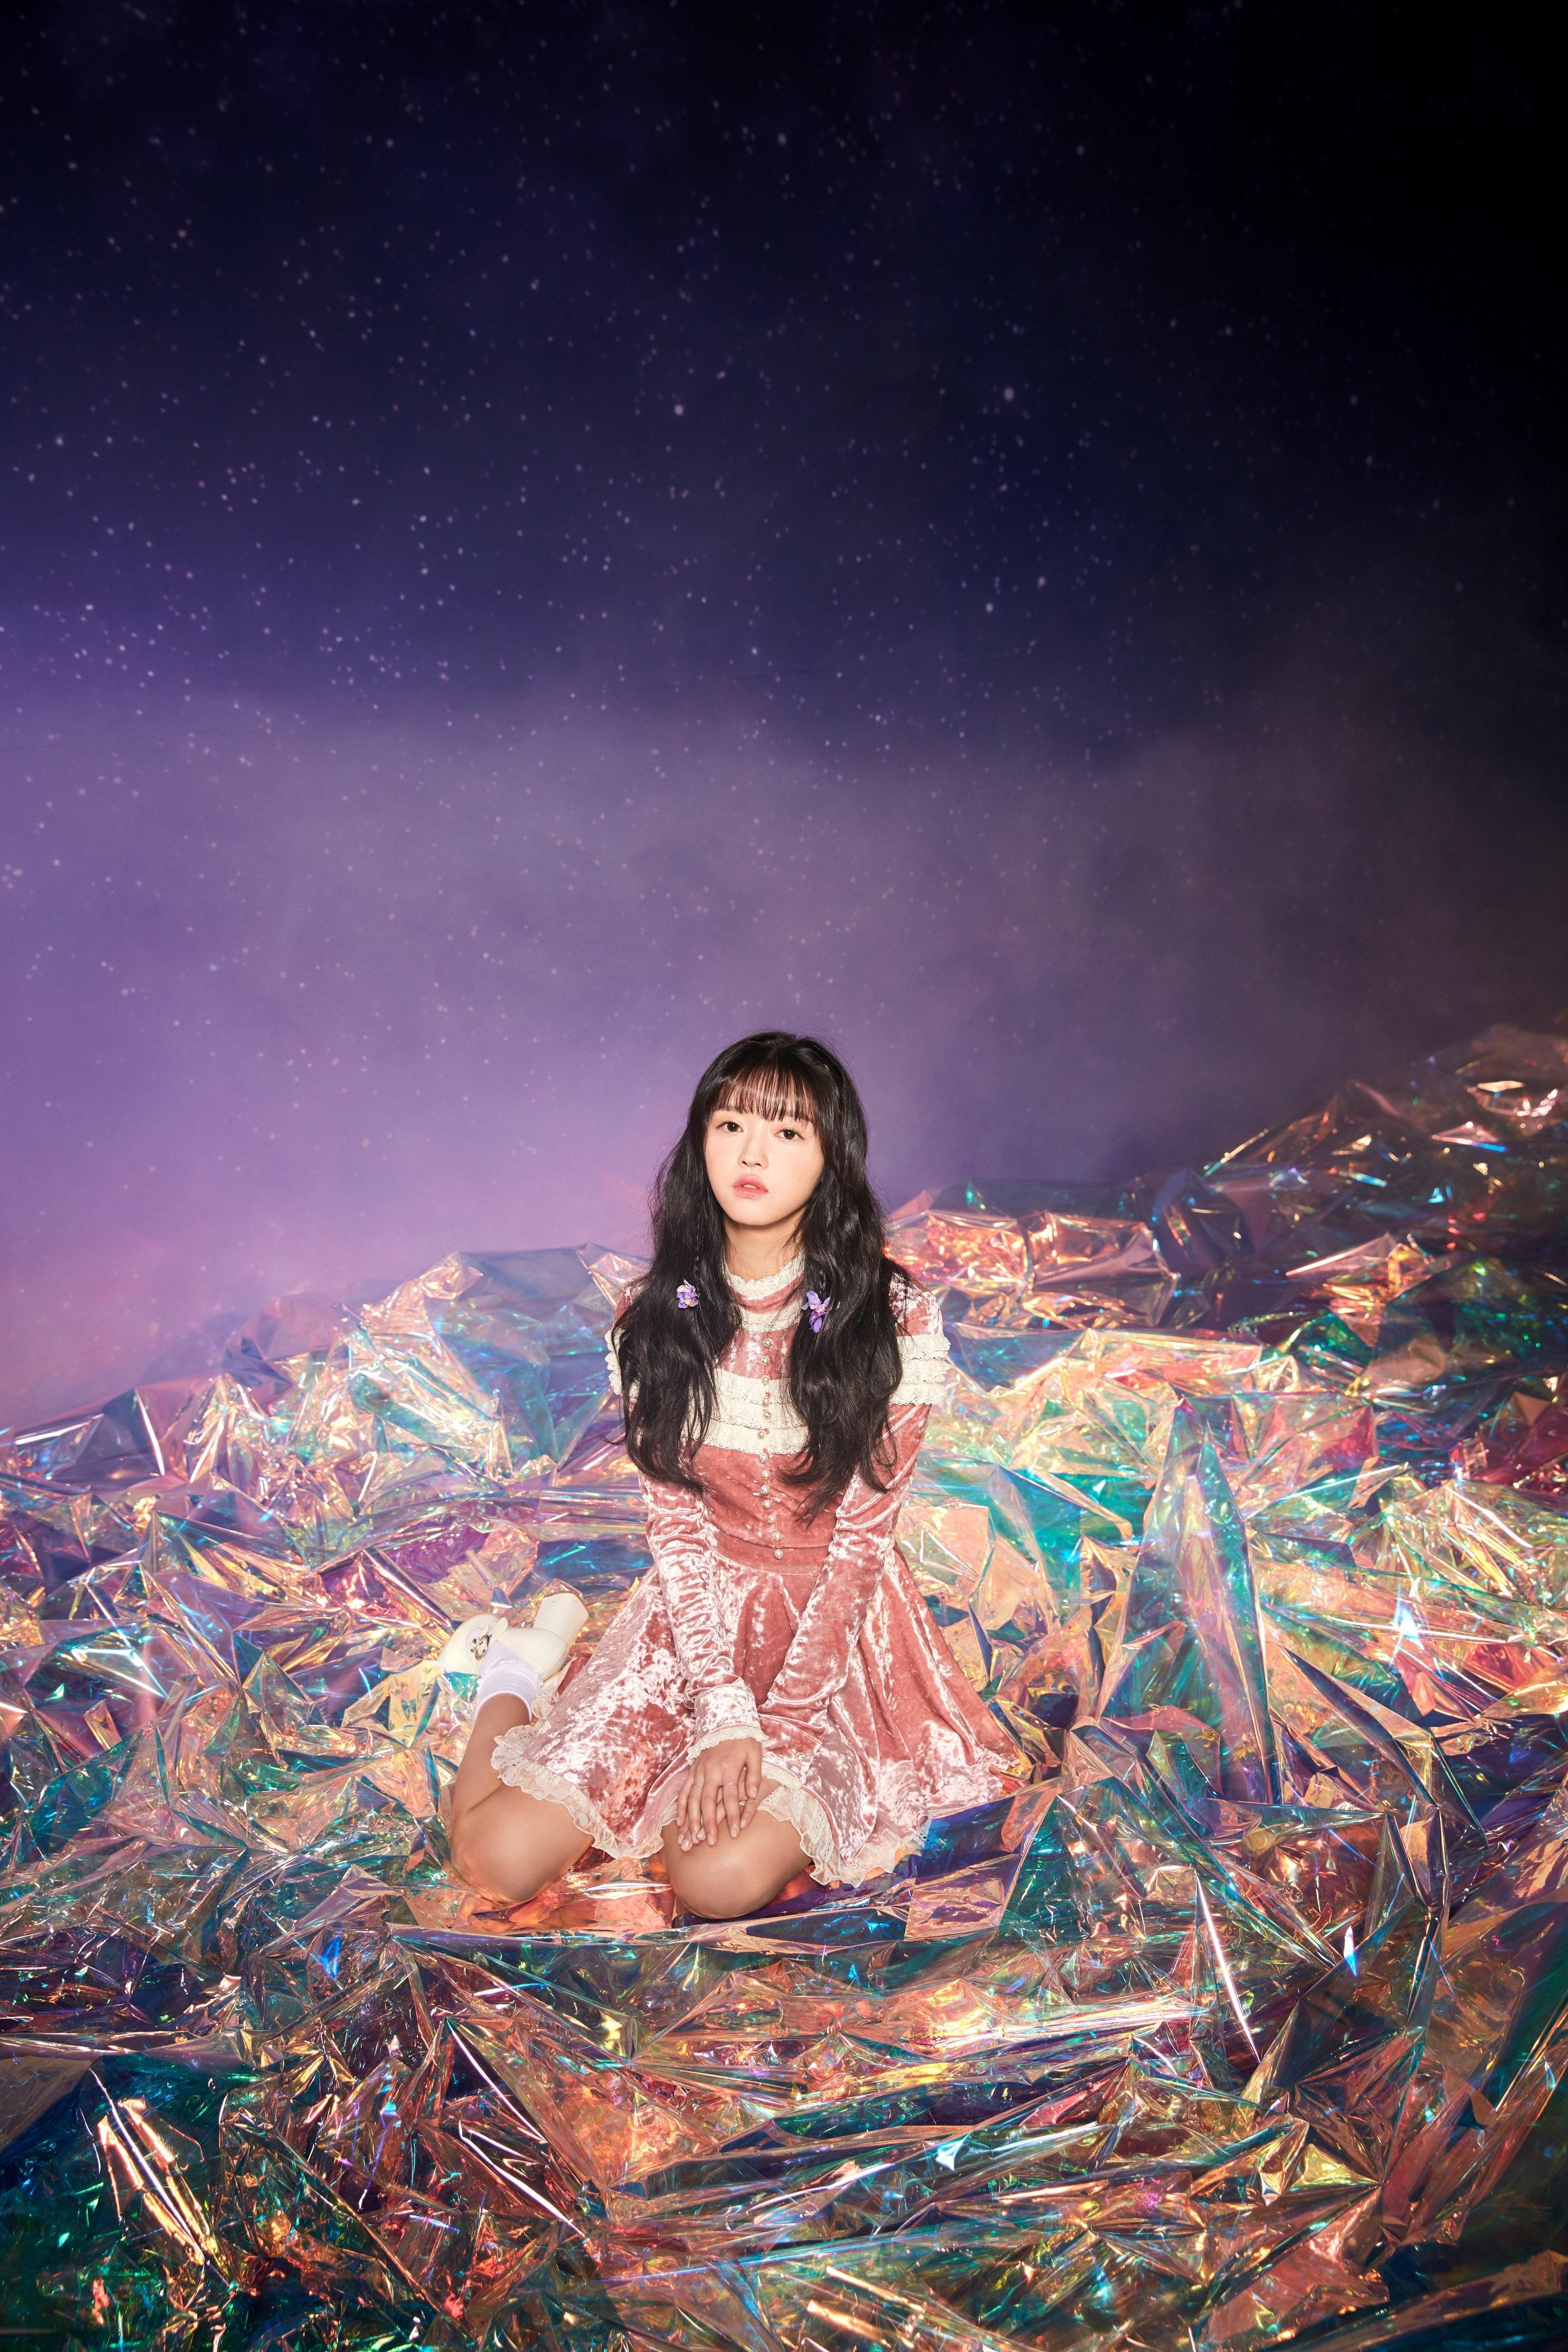 My Secret Garden: K-Pop Database / Dbkpop.com